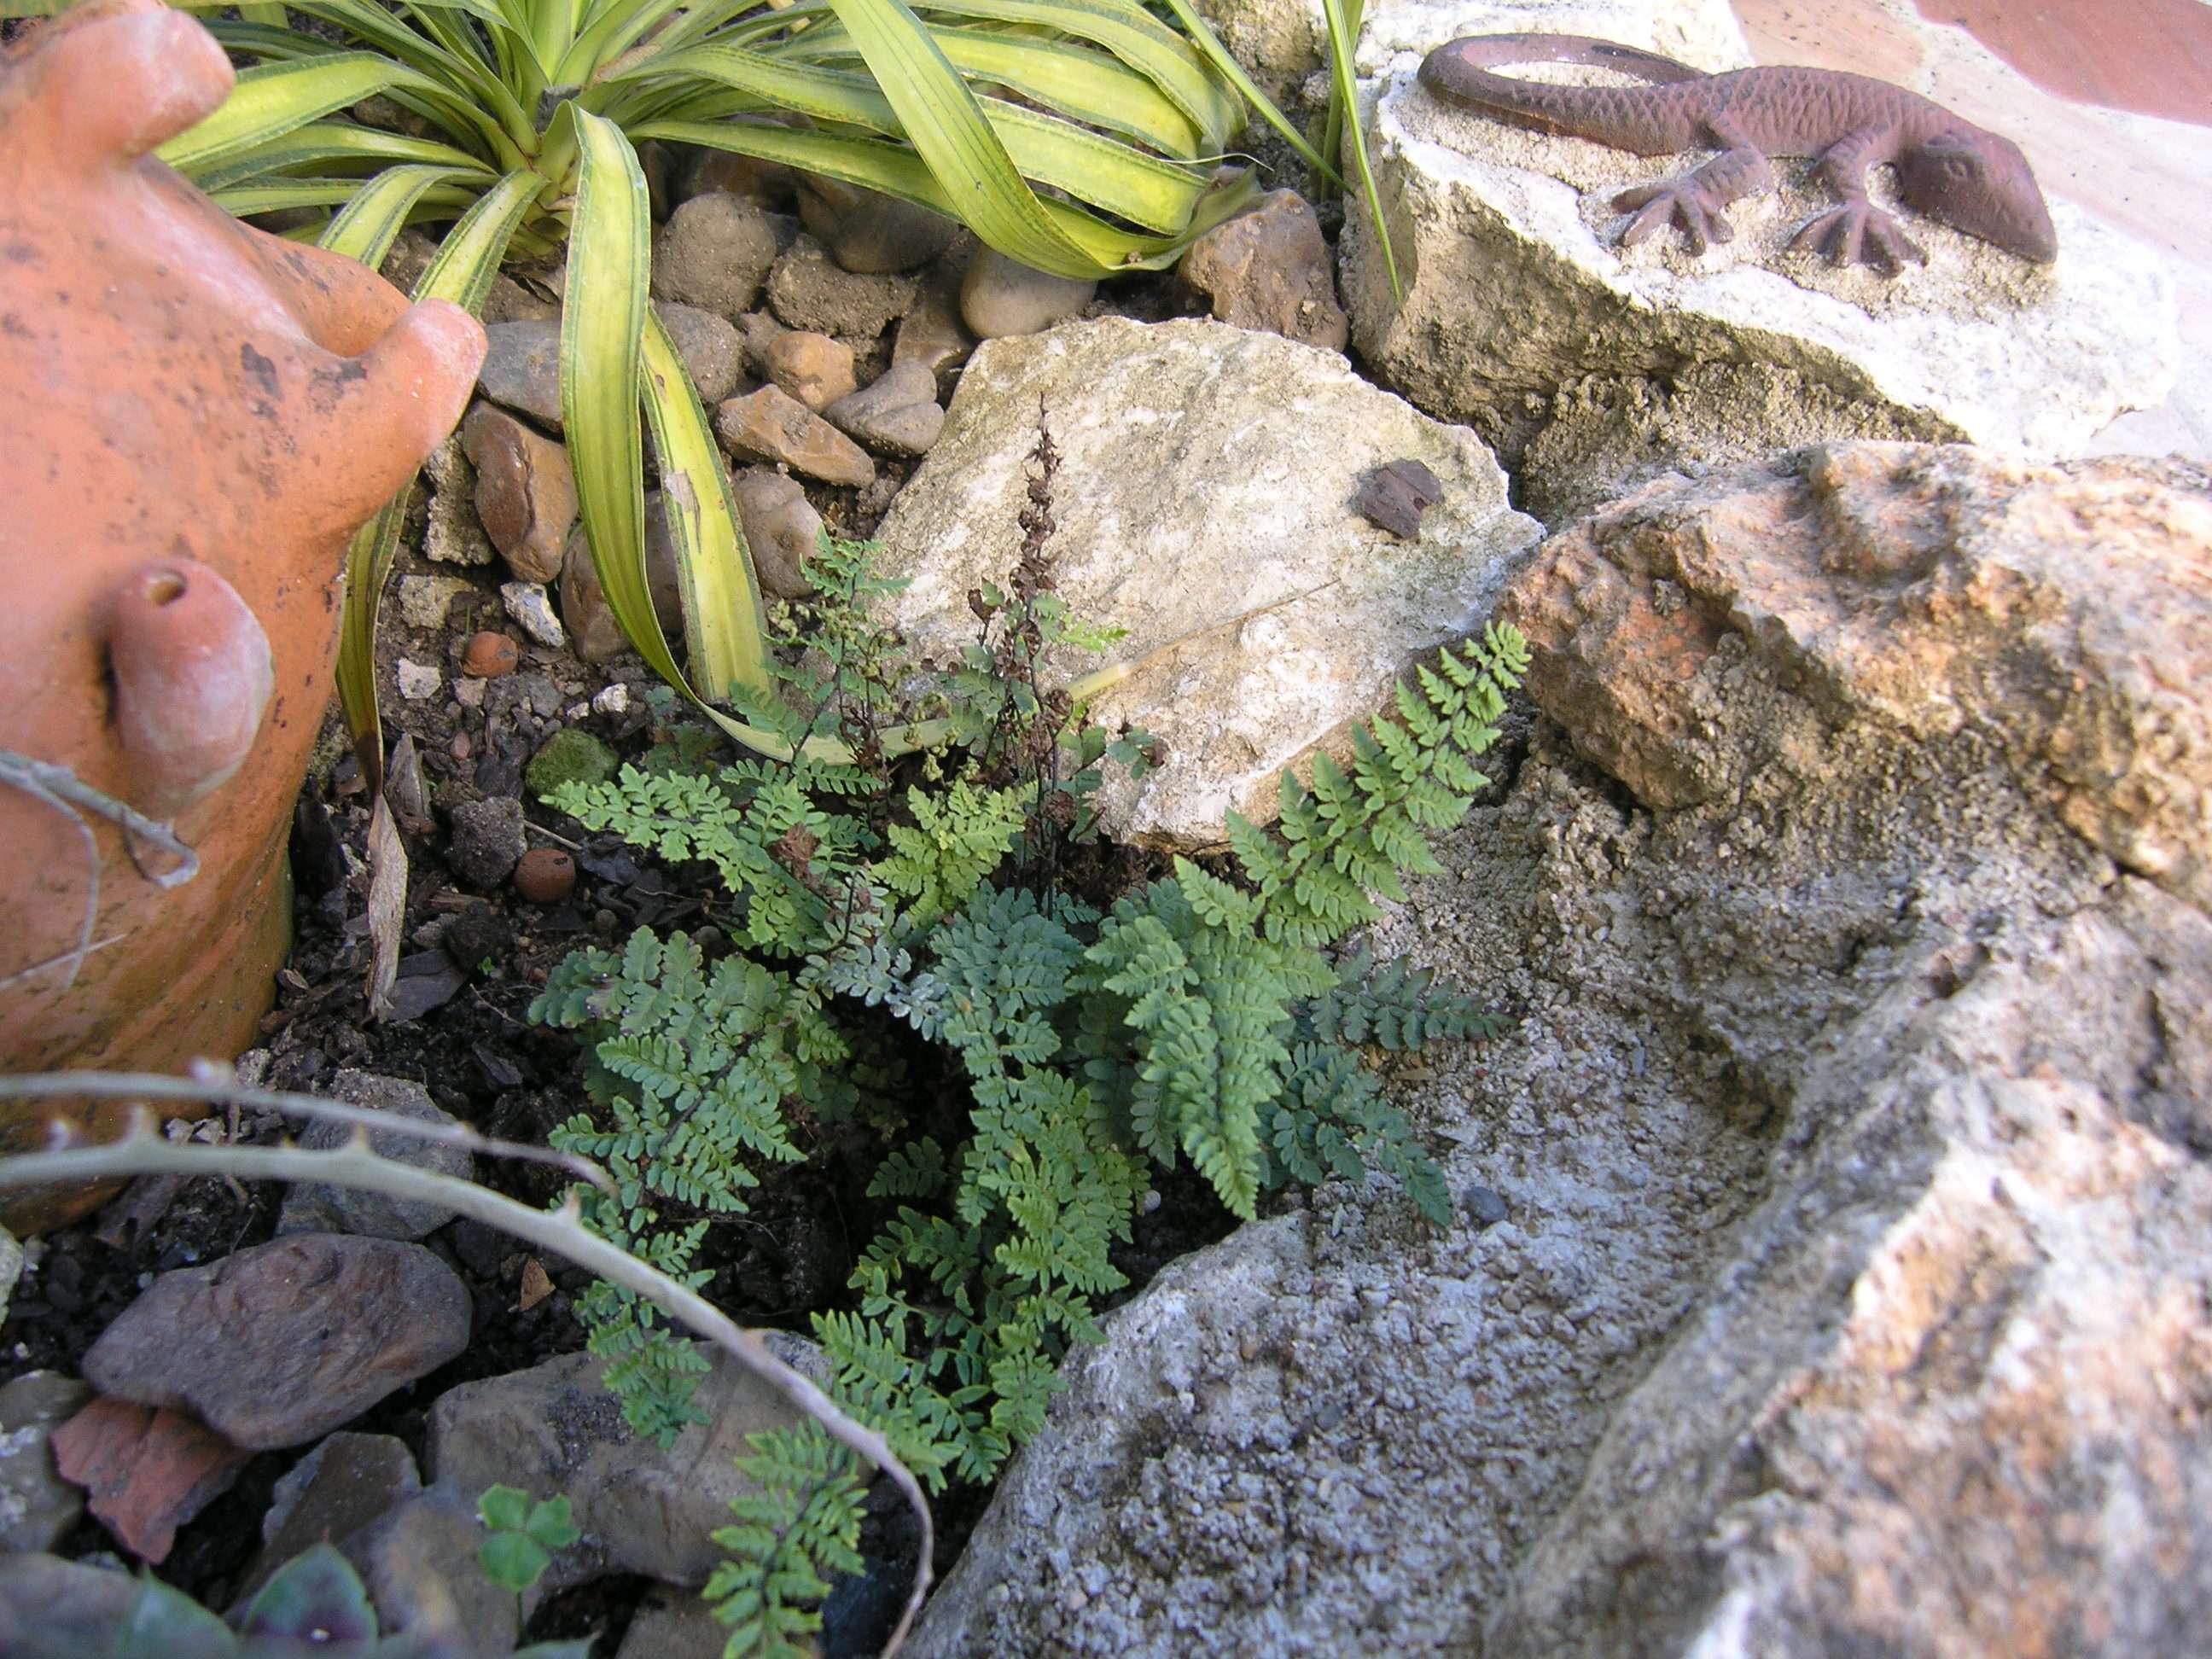 Cheilanthes alabamensis